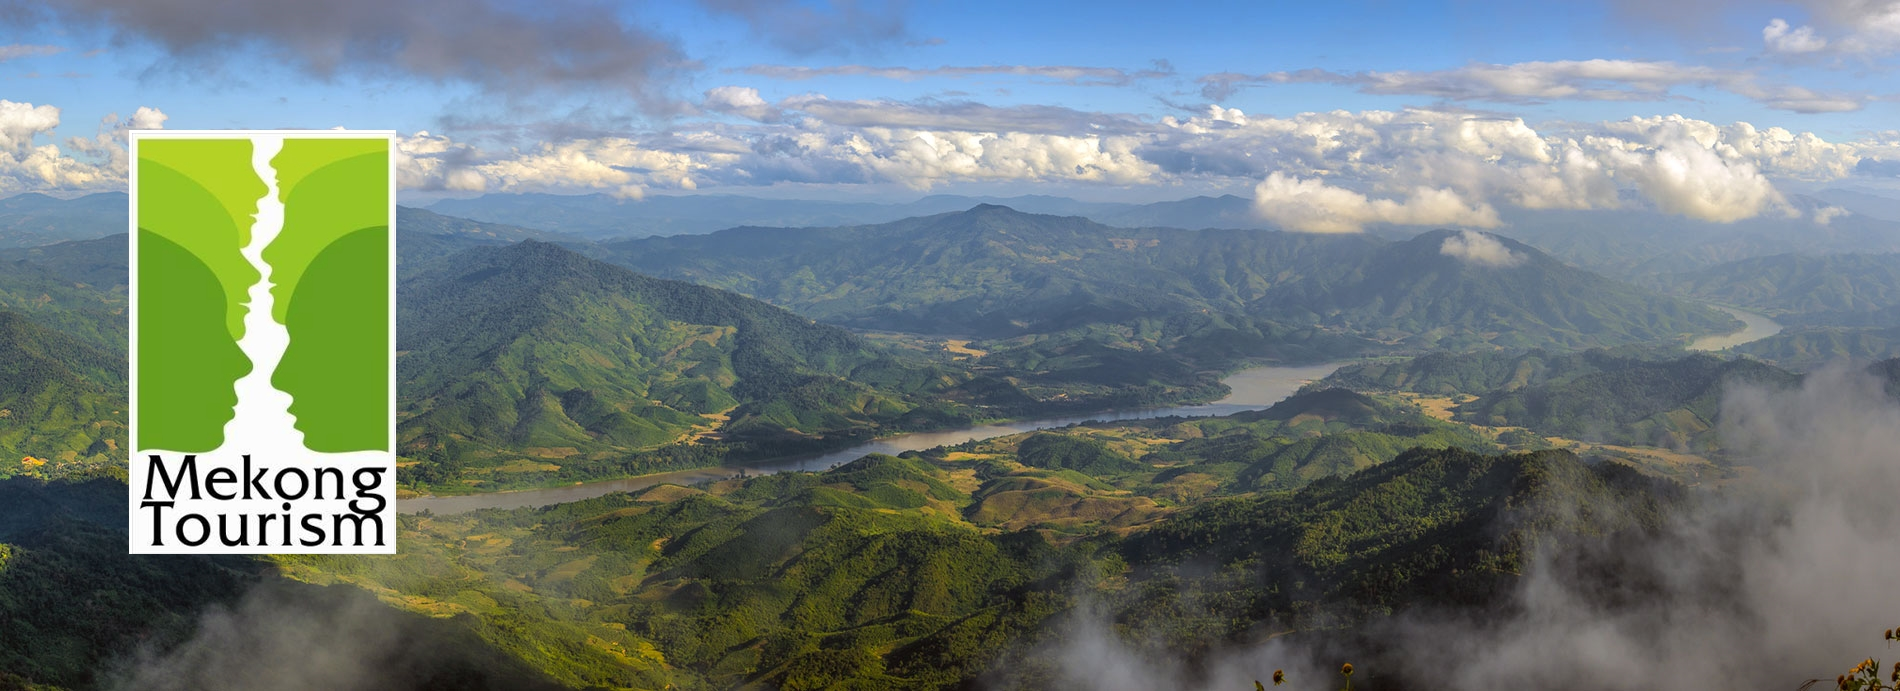 Laos Mekong Tours Travel